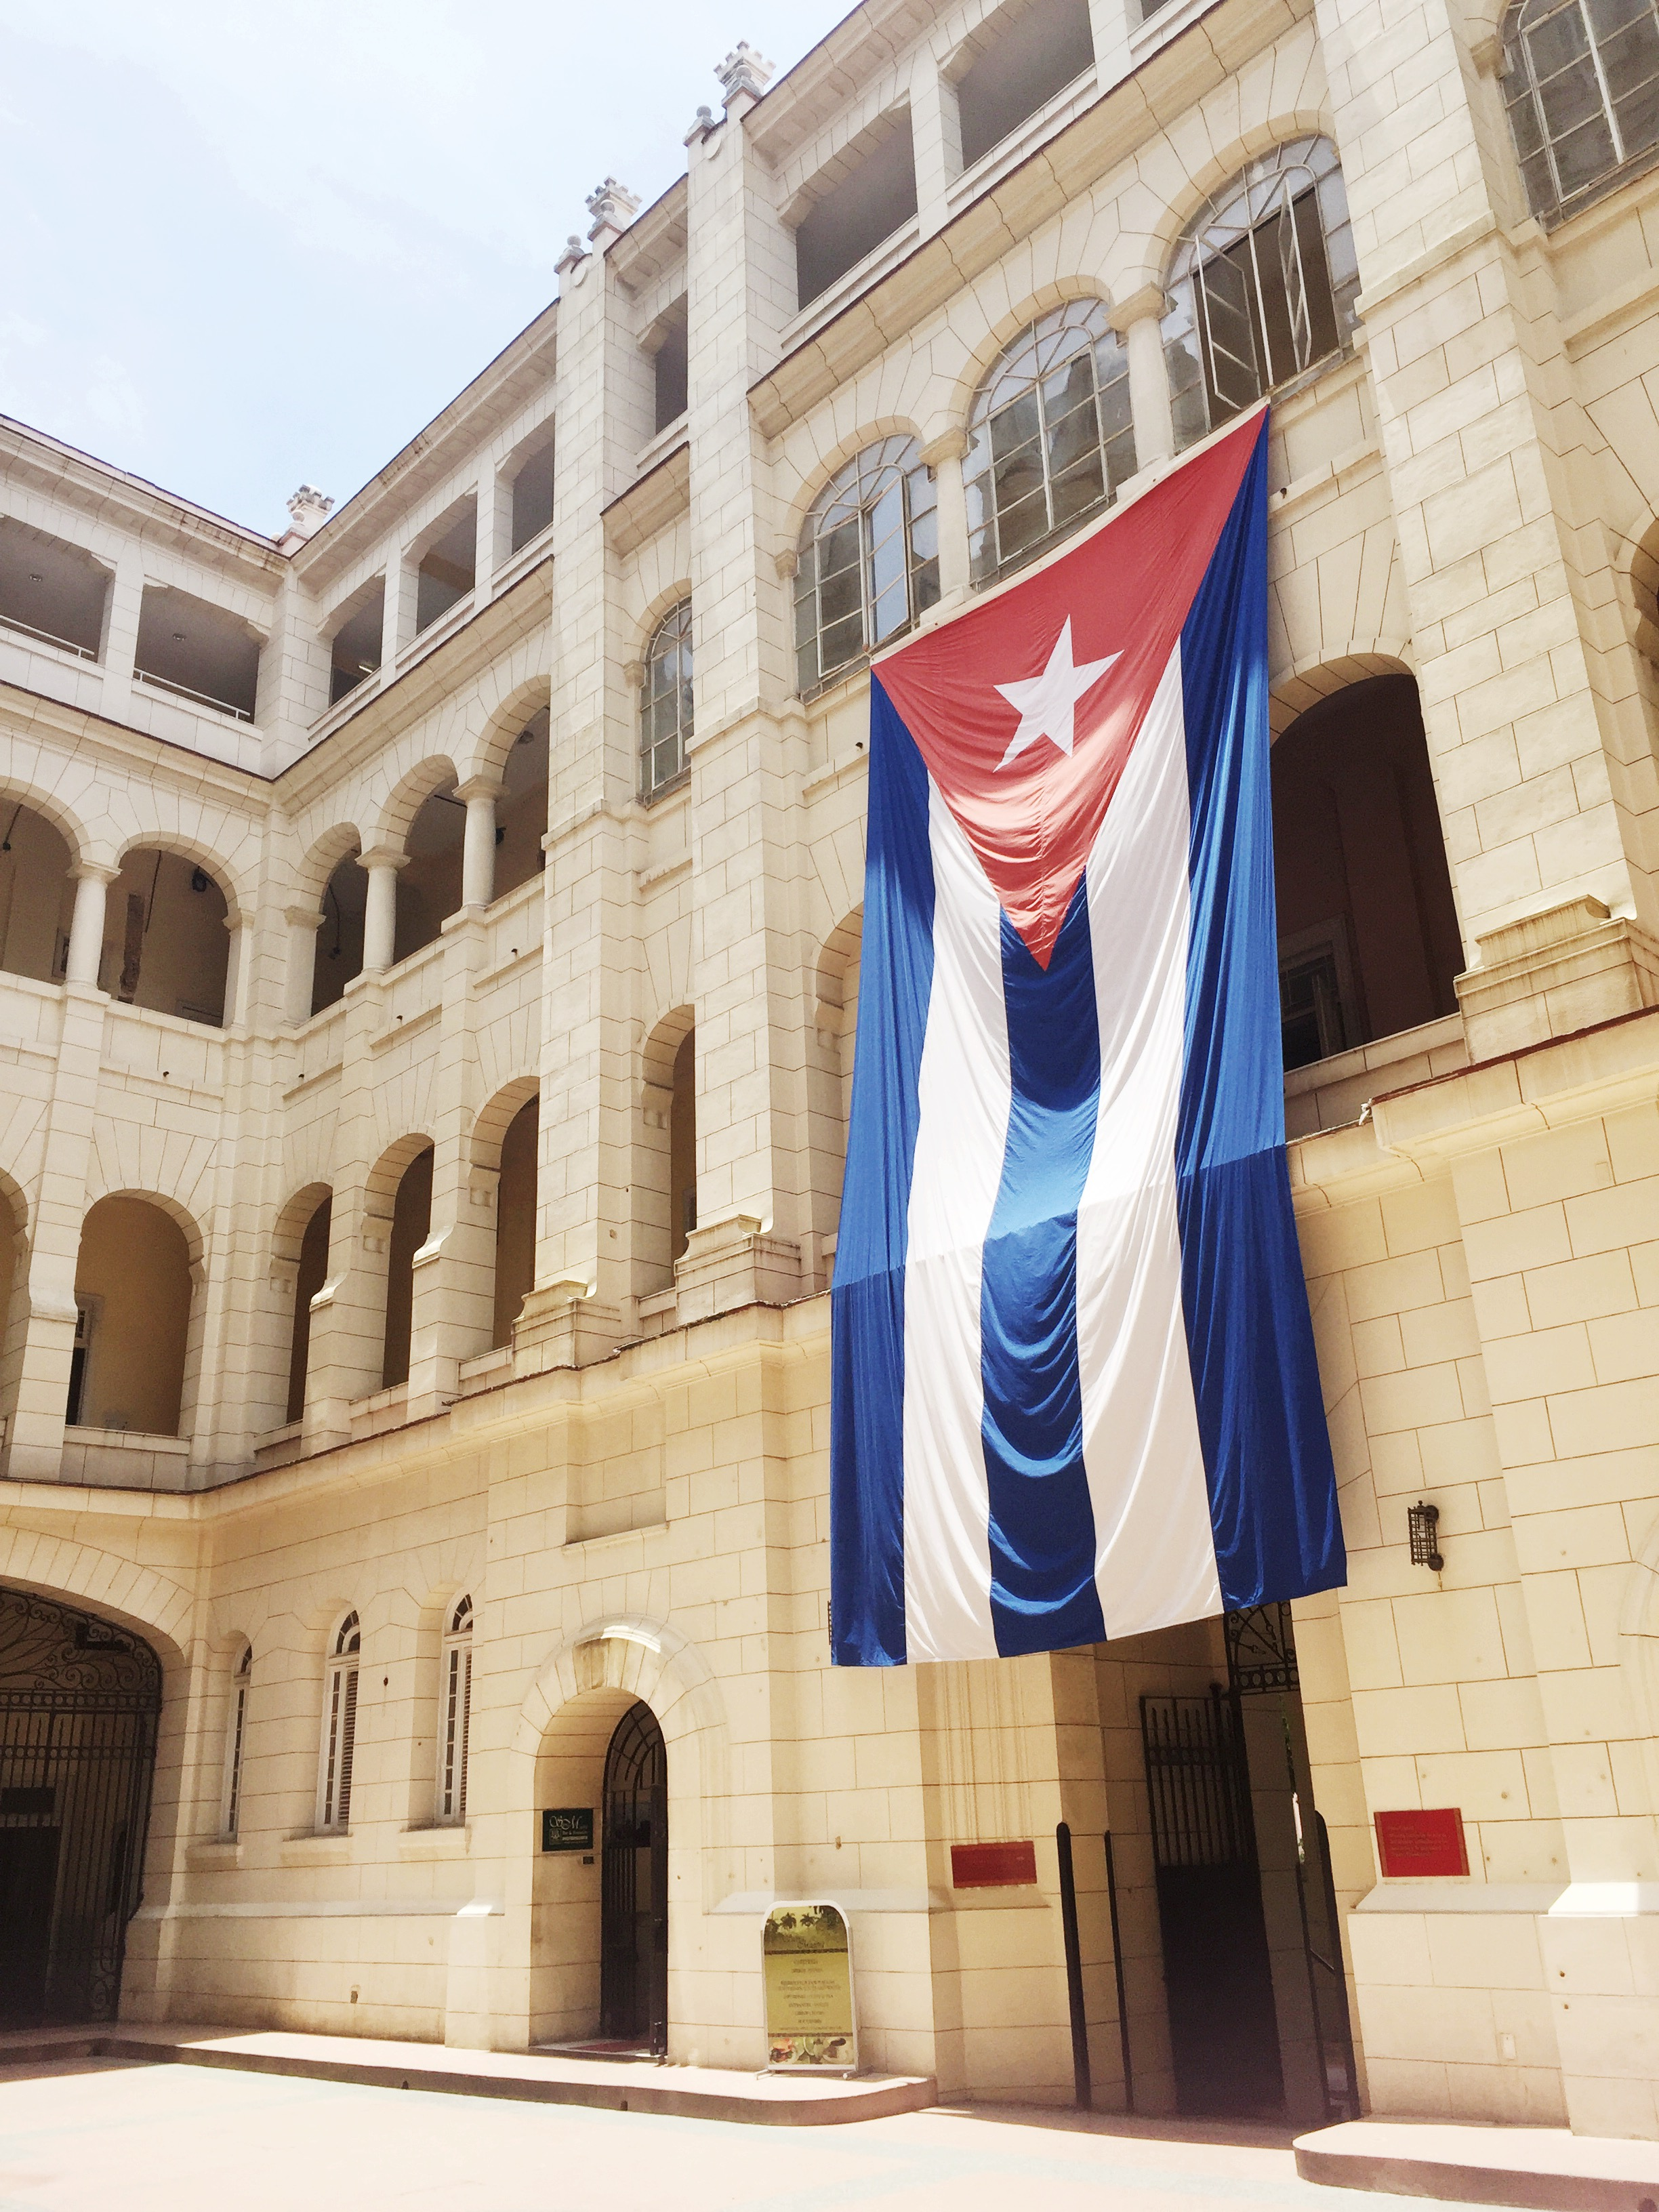 Havana on Film: A Travel Guide  |  LITTLE HENRY LEE